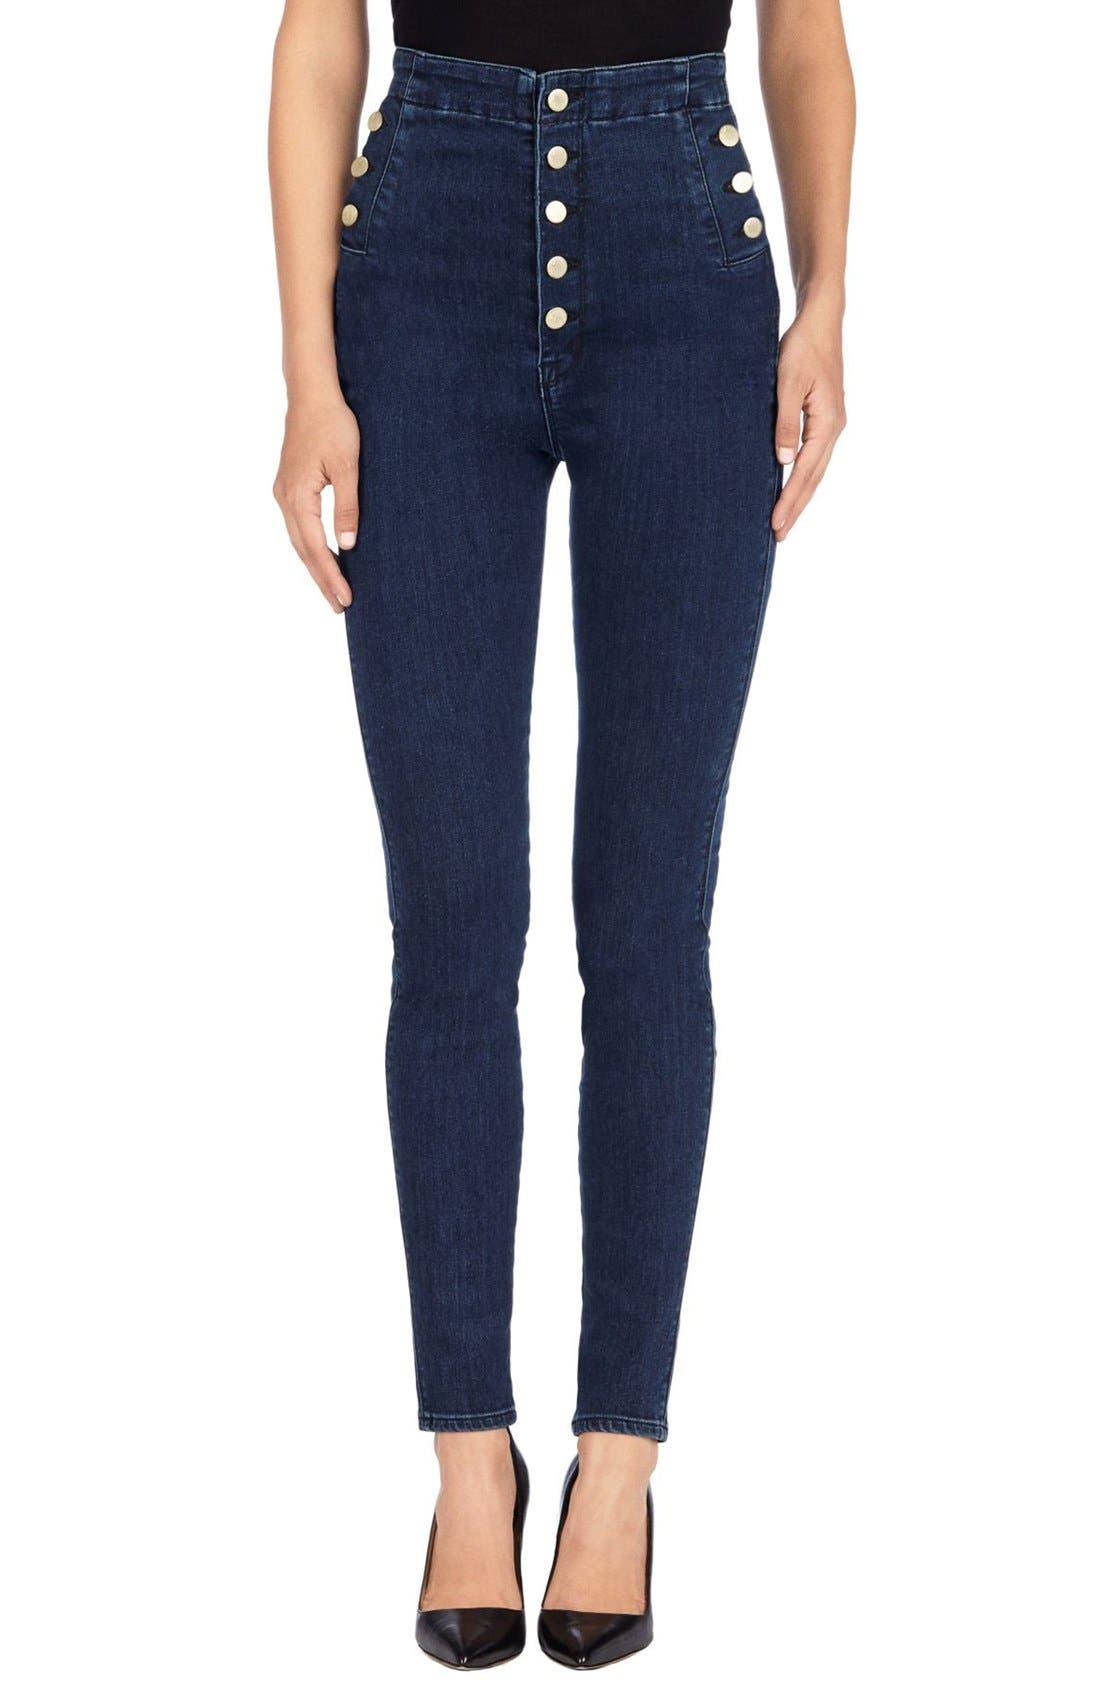 'Natasha Sky High' High Rise Skinny Jeans,                         Main,                         color, 410